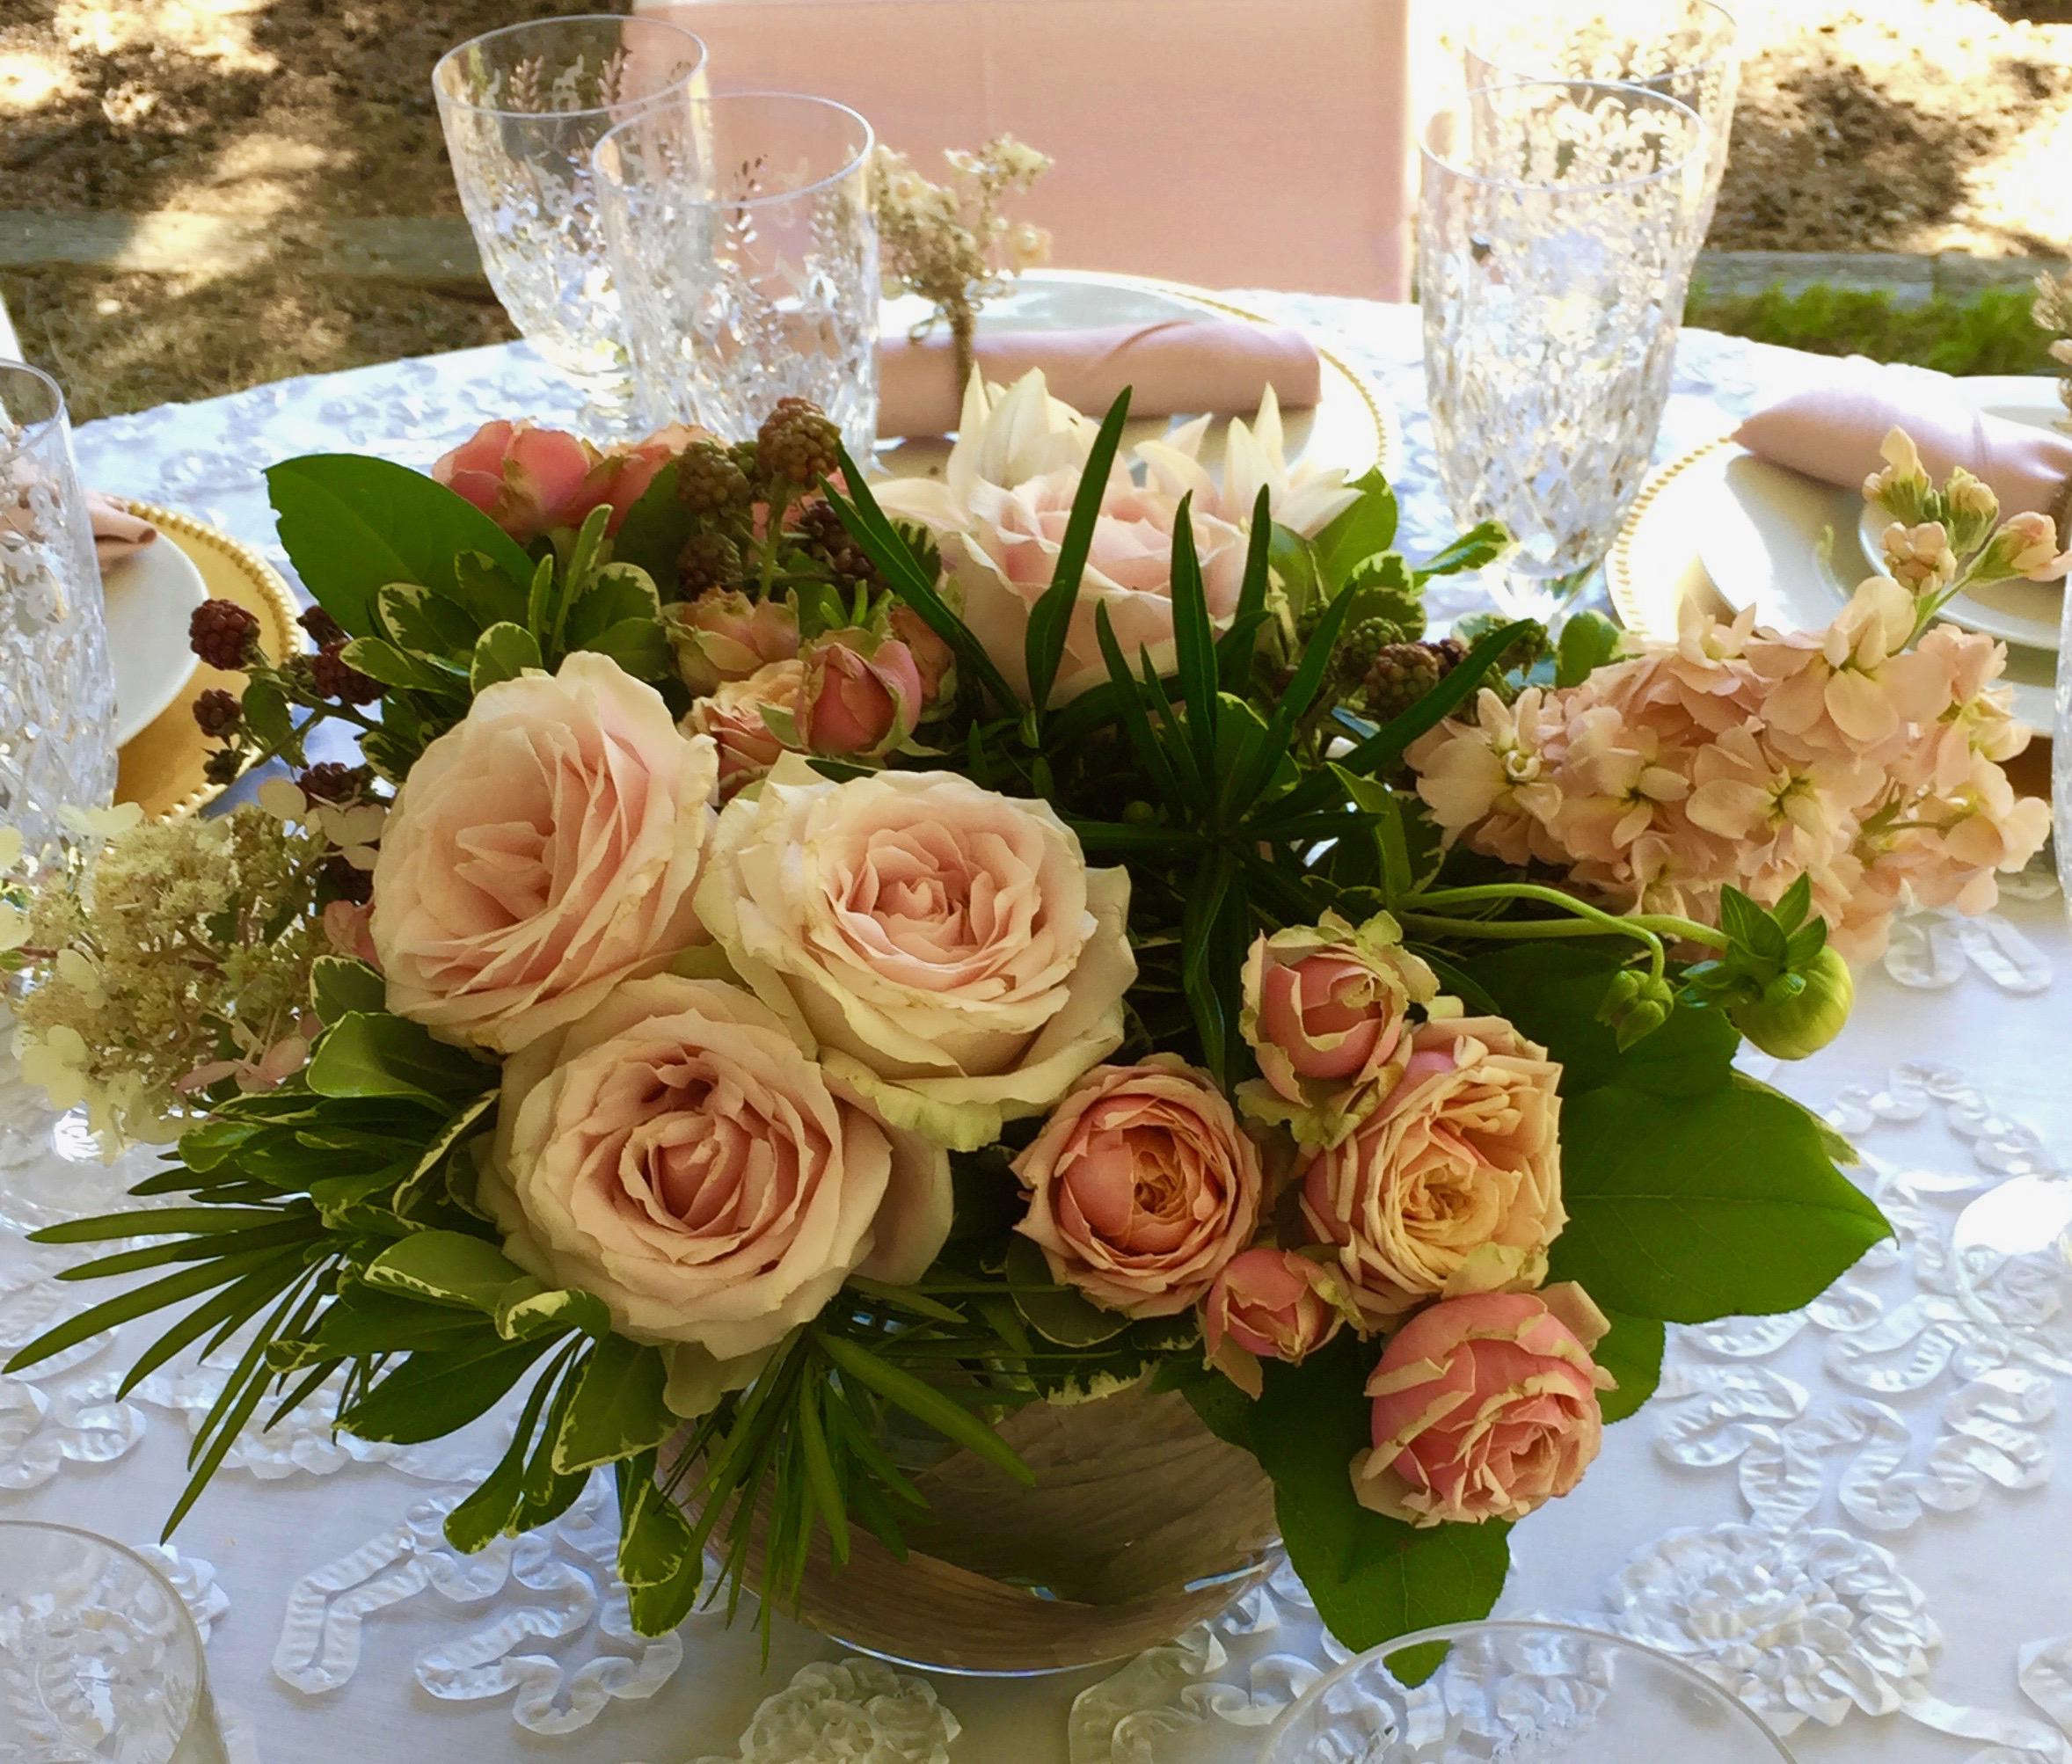 Blush tones-centerpiece with garden roses, stock and dahlias